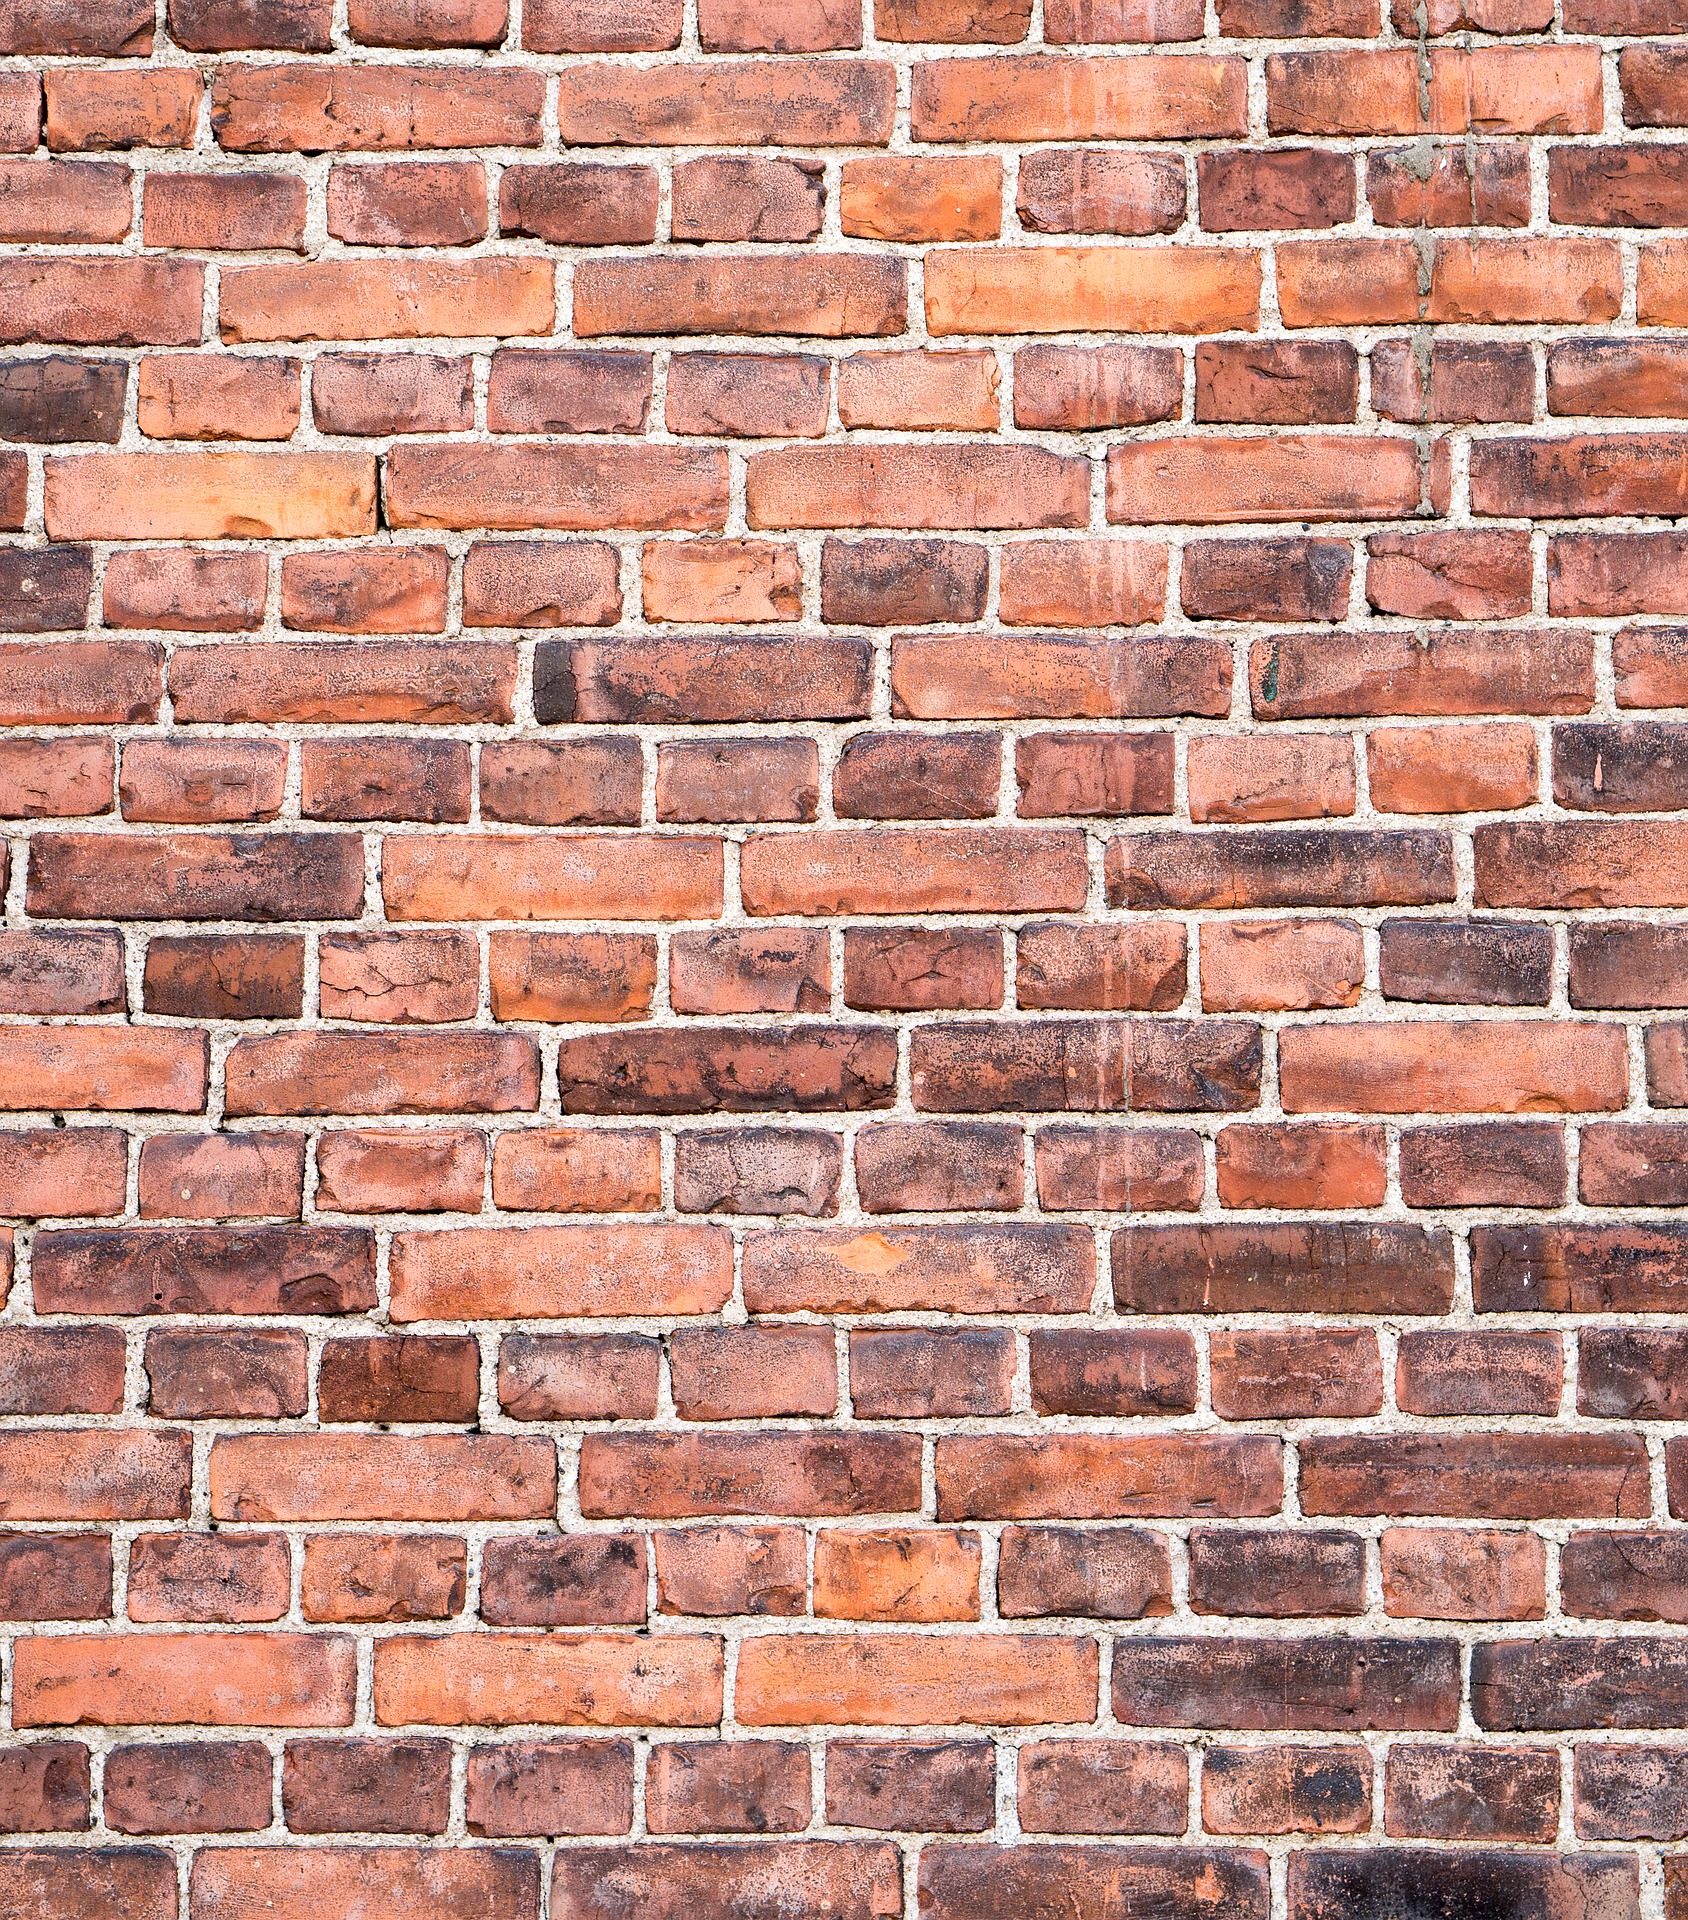 Brick Wall, Architecture, Block, Brick, Construction, HQ Photo